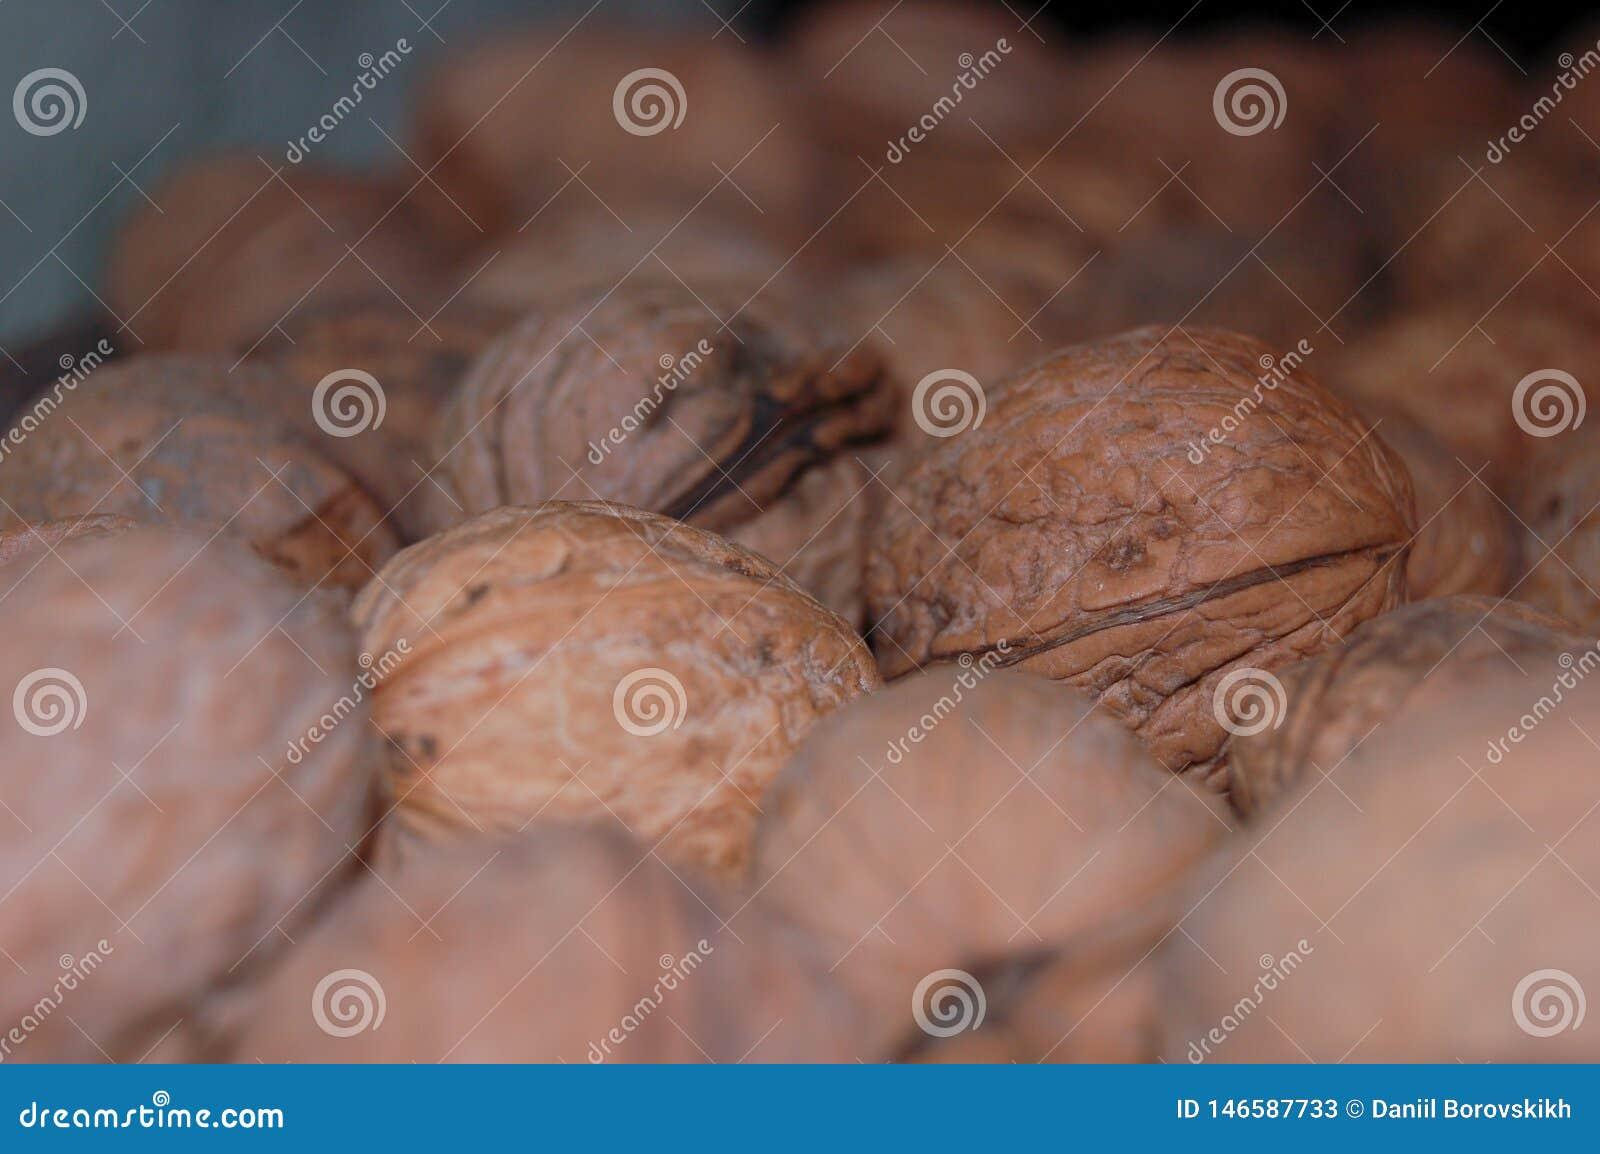 Серии грецких орехов на полке